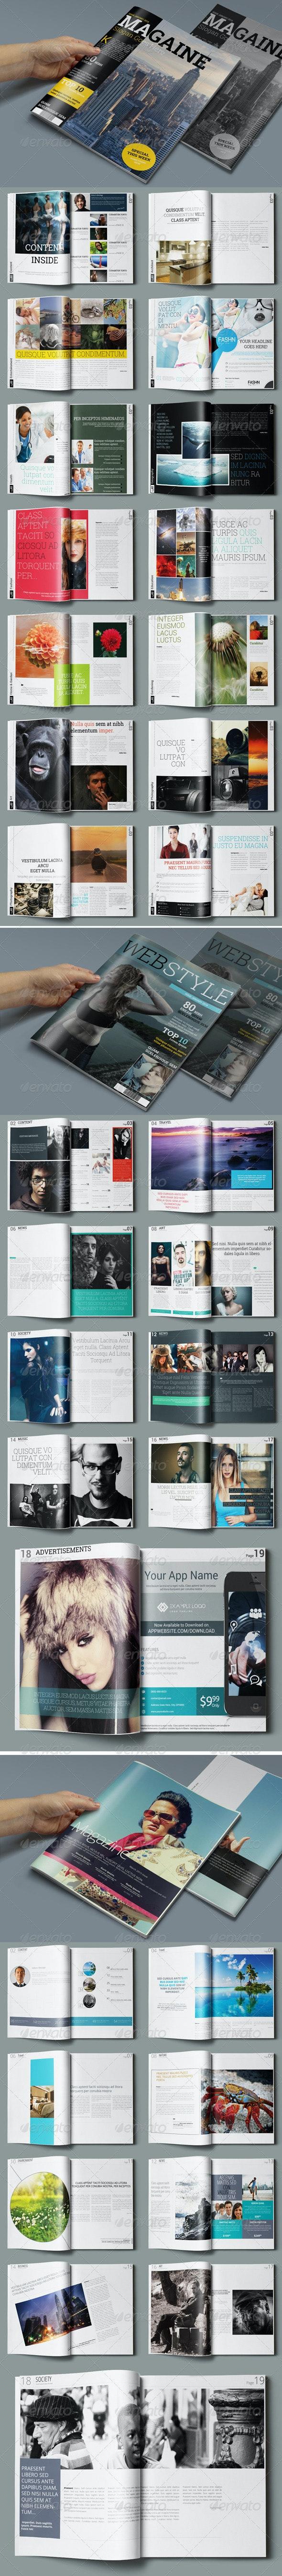 3in1 Magazine Bundle - Magazines Print Templates